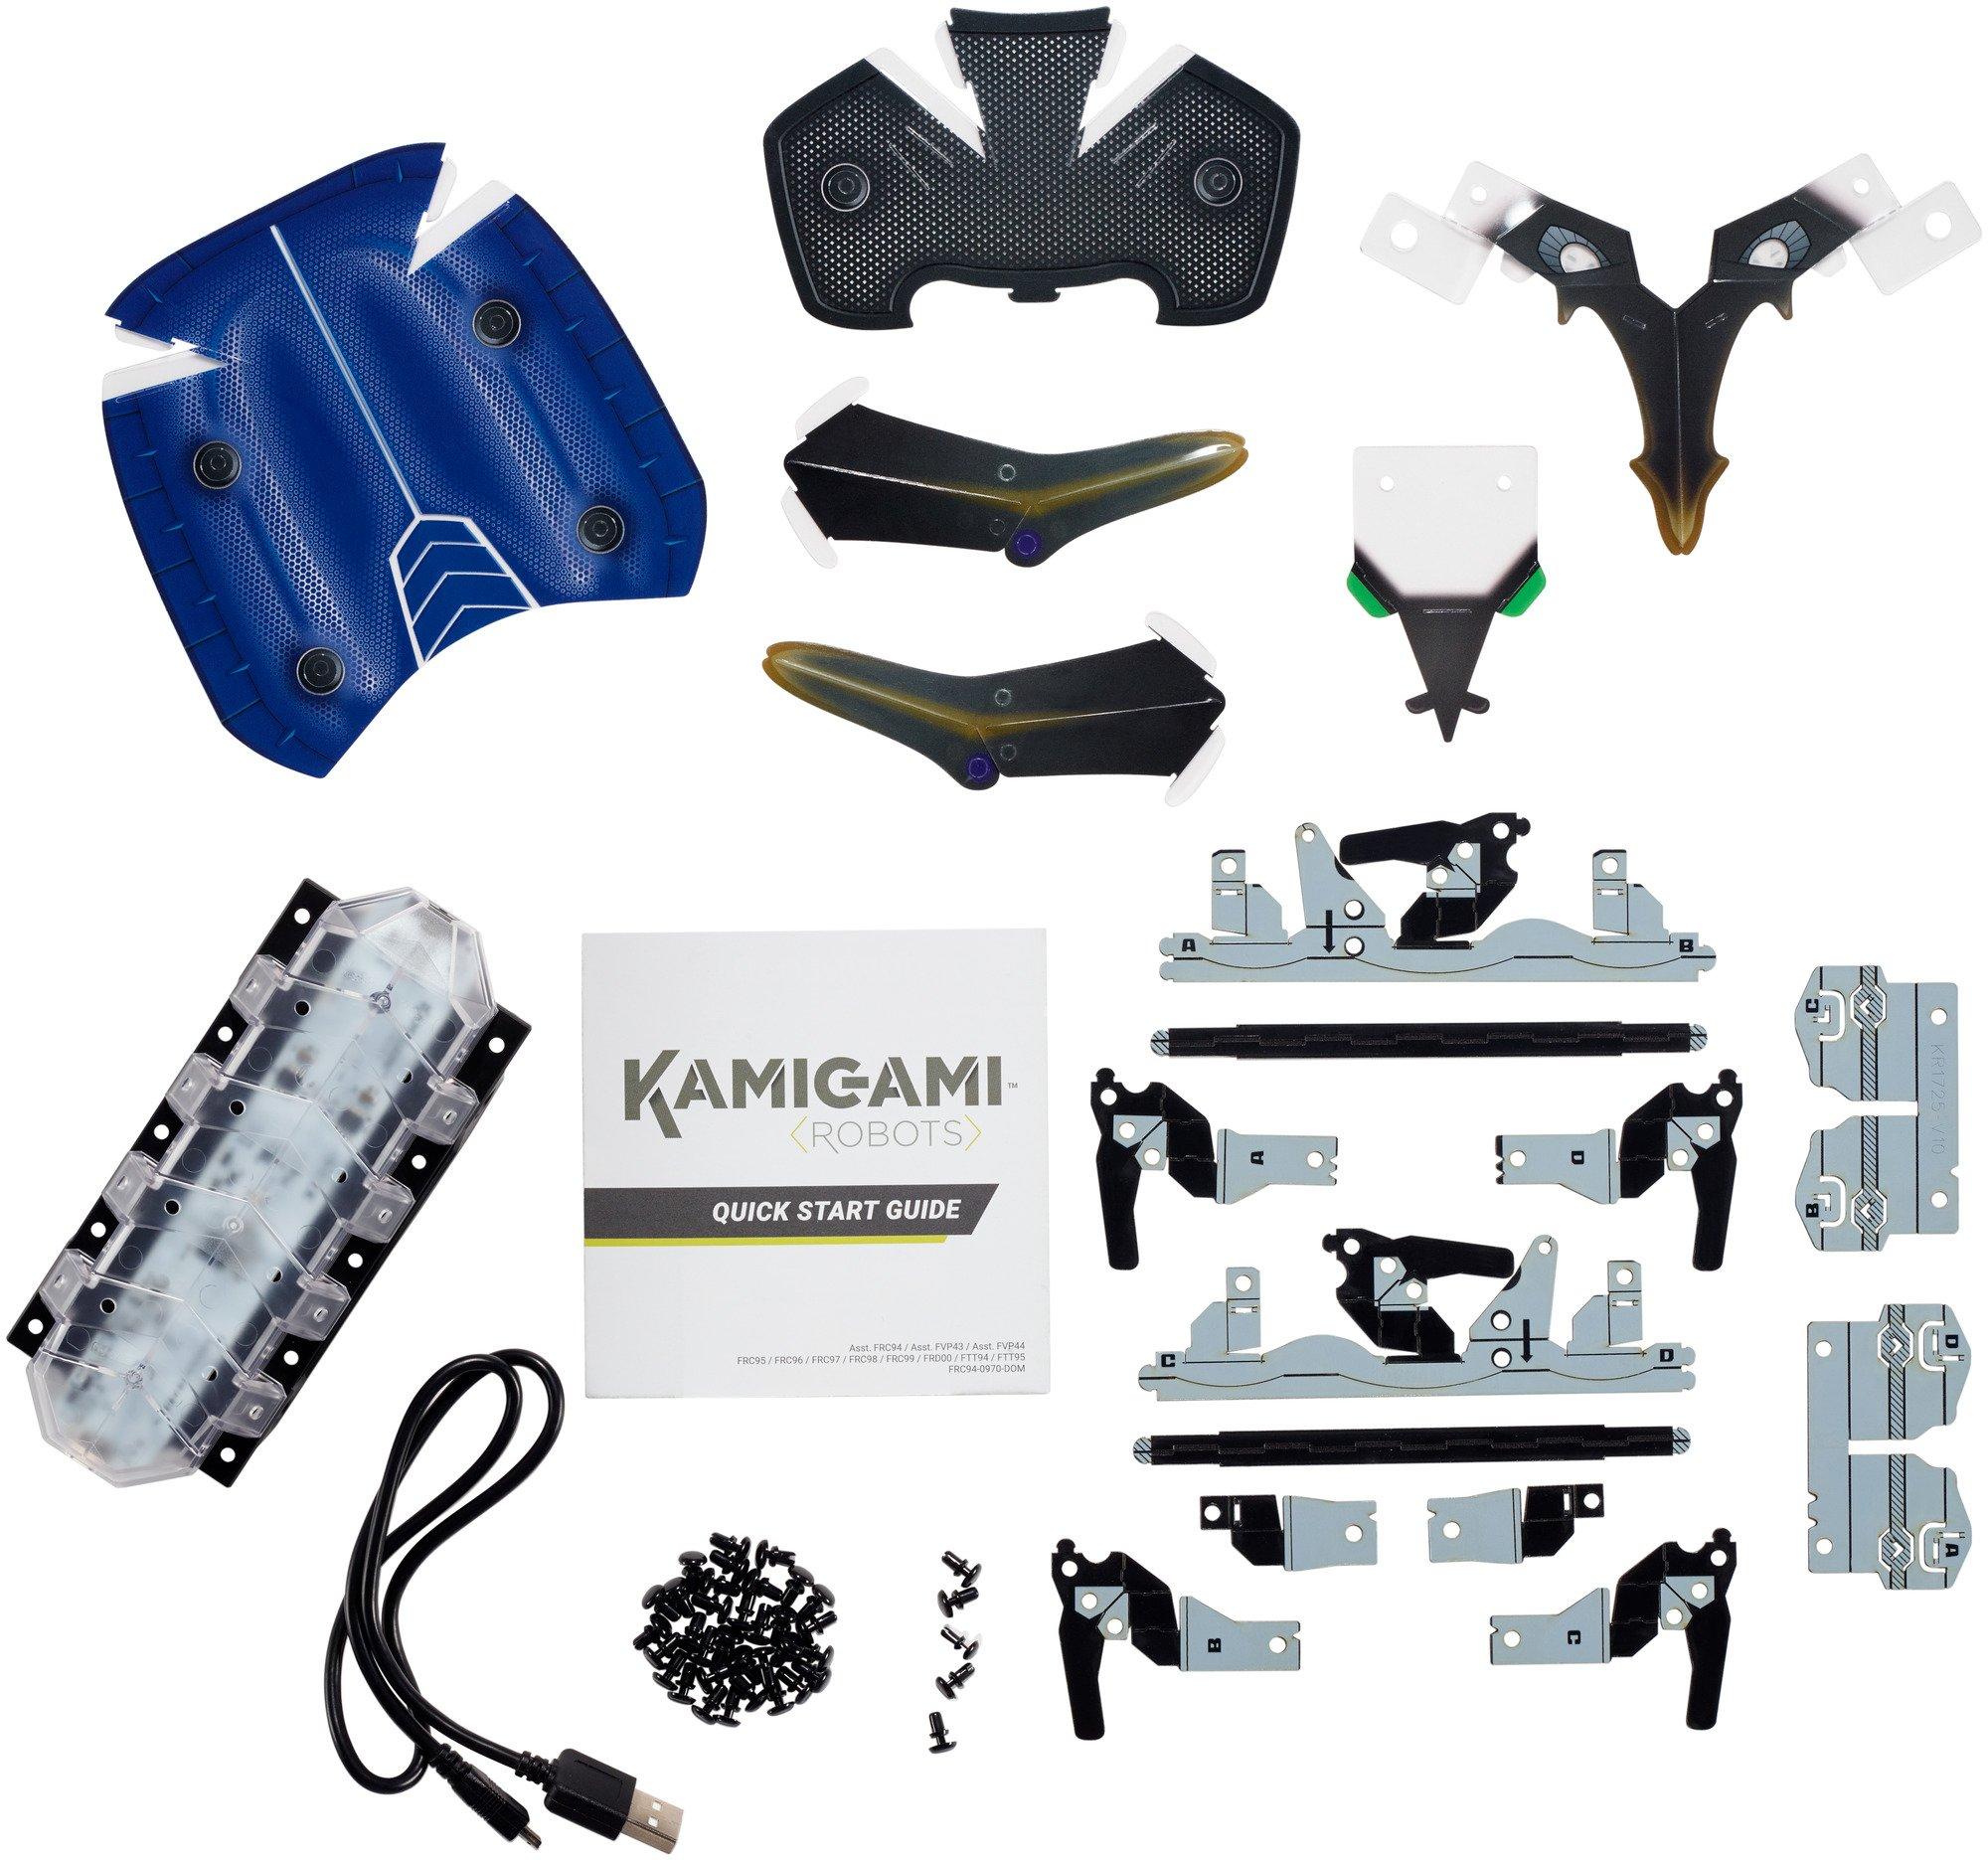 Kamigami Atlasar Robot by Mattel (Image #3)